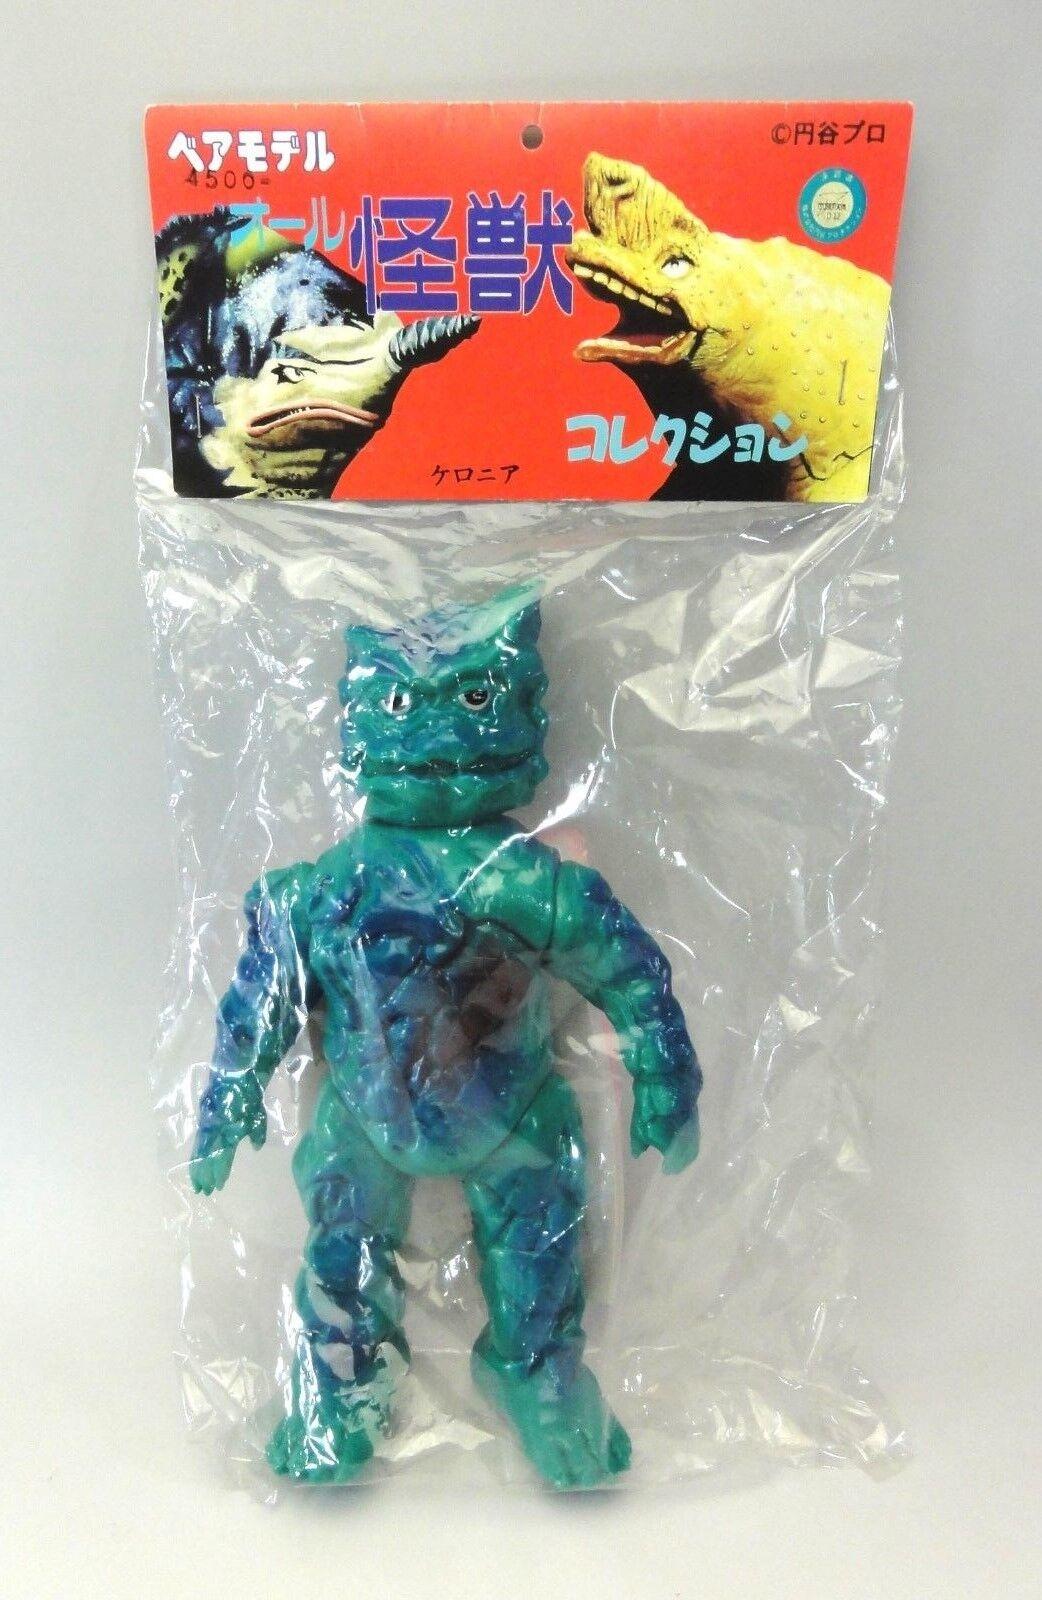 KERONIA Kaijyu Collection Sofubi Vinyle Figure Ultra Man BEAR MODEL JAPAN